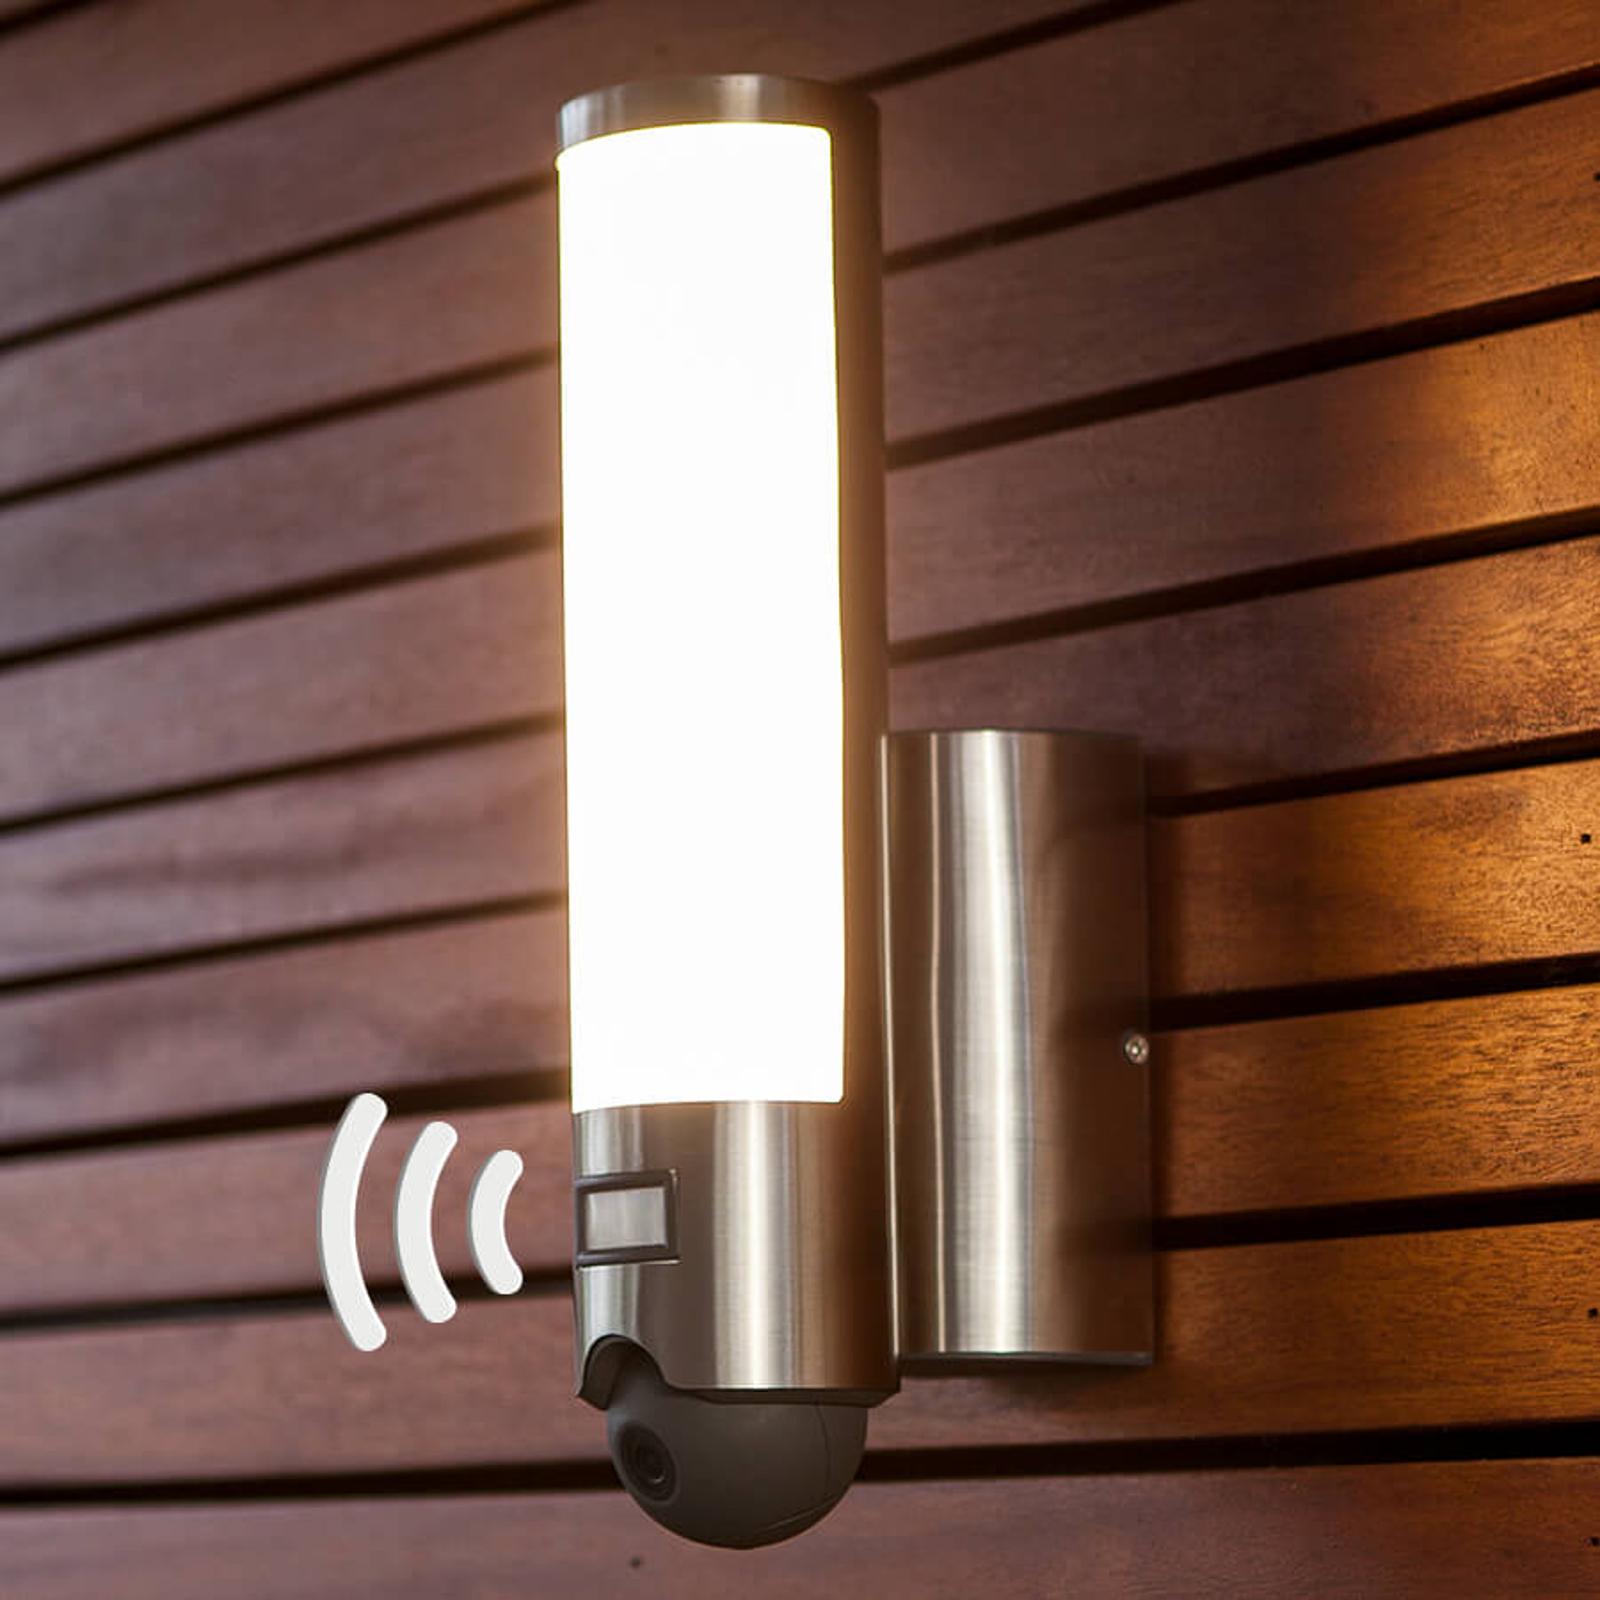 Integrated camera LED outdoor wall lamp Elara Cam_3006507_1